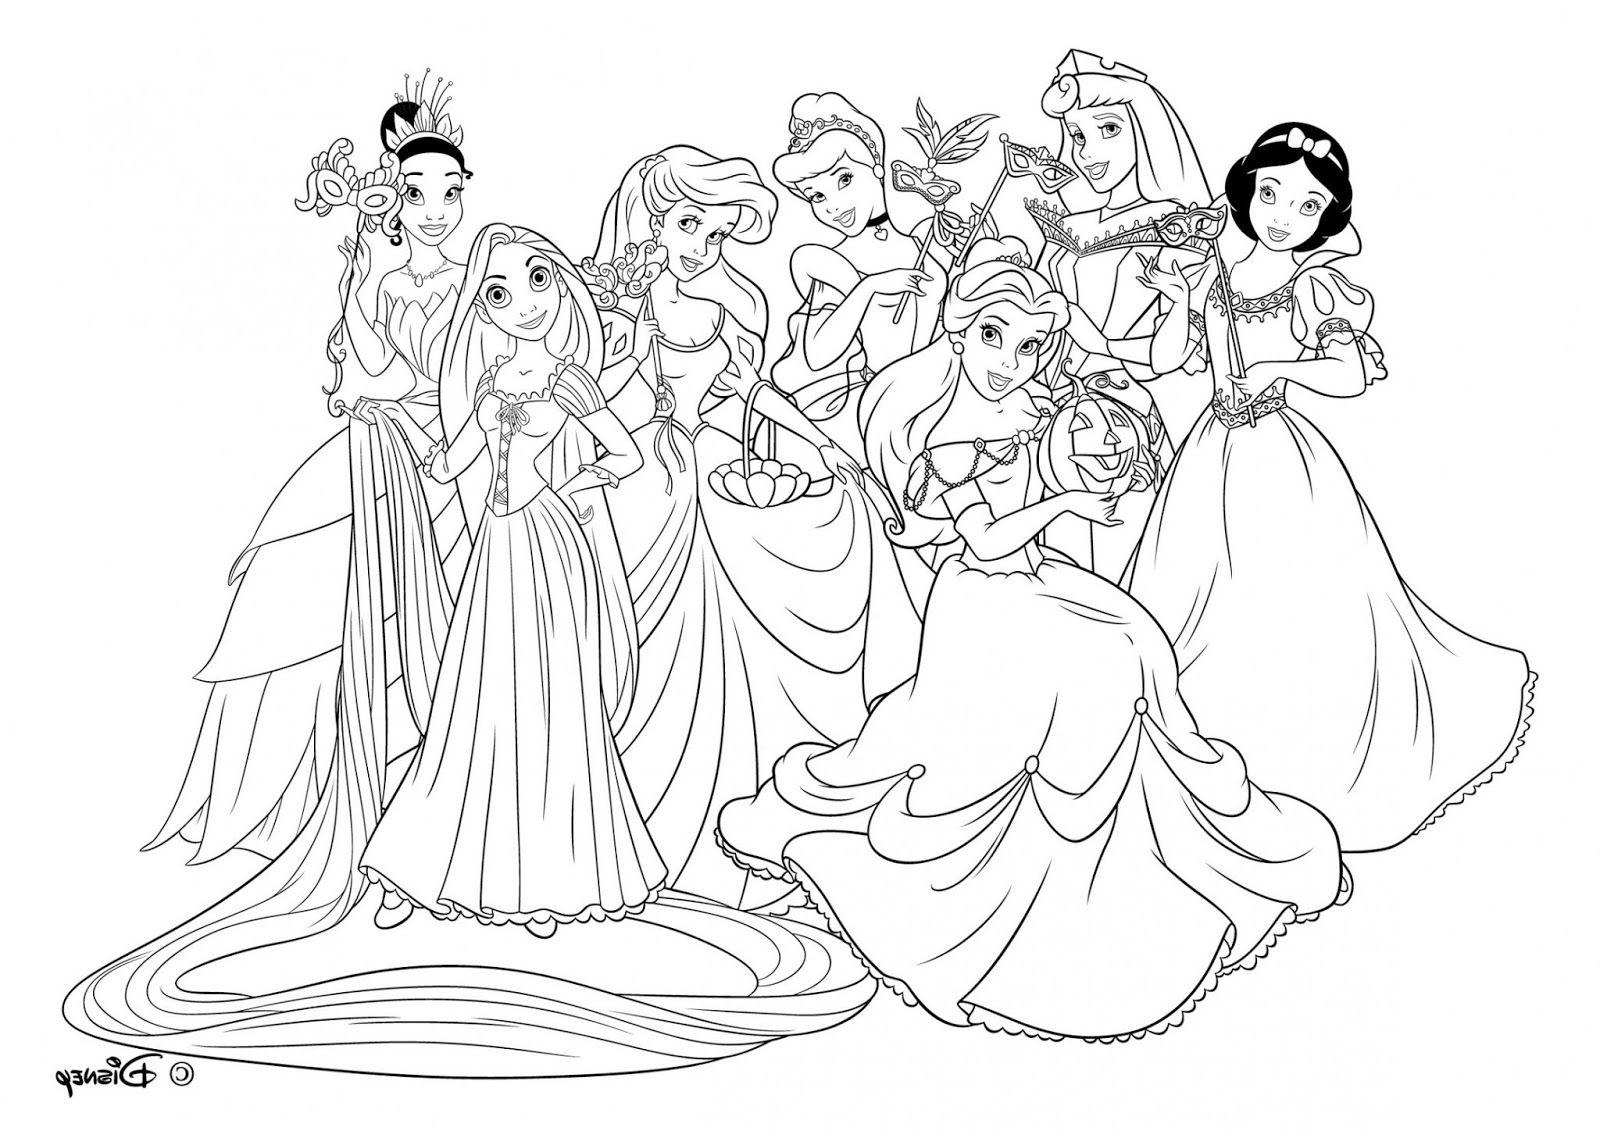 coloriage princesse | Coloriage à imprimer princesse, Coloriage princesse, Coloriage